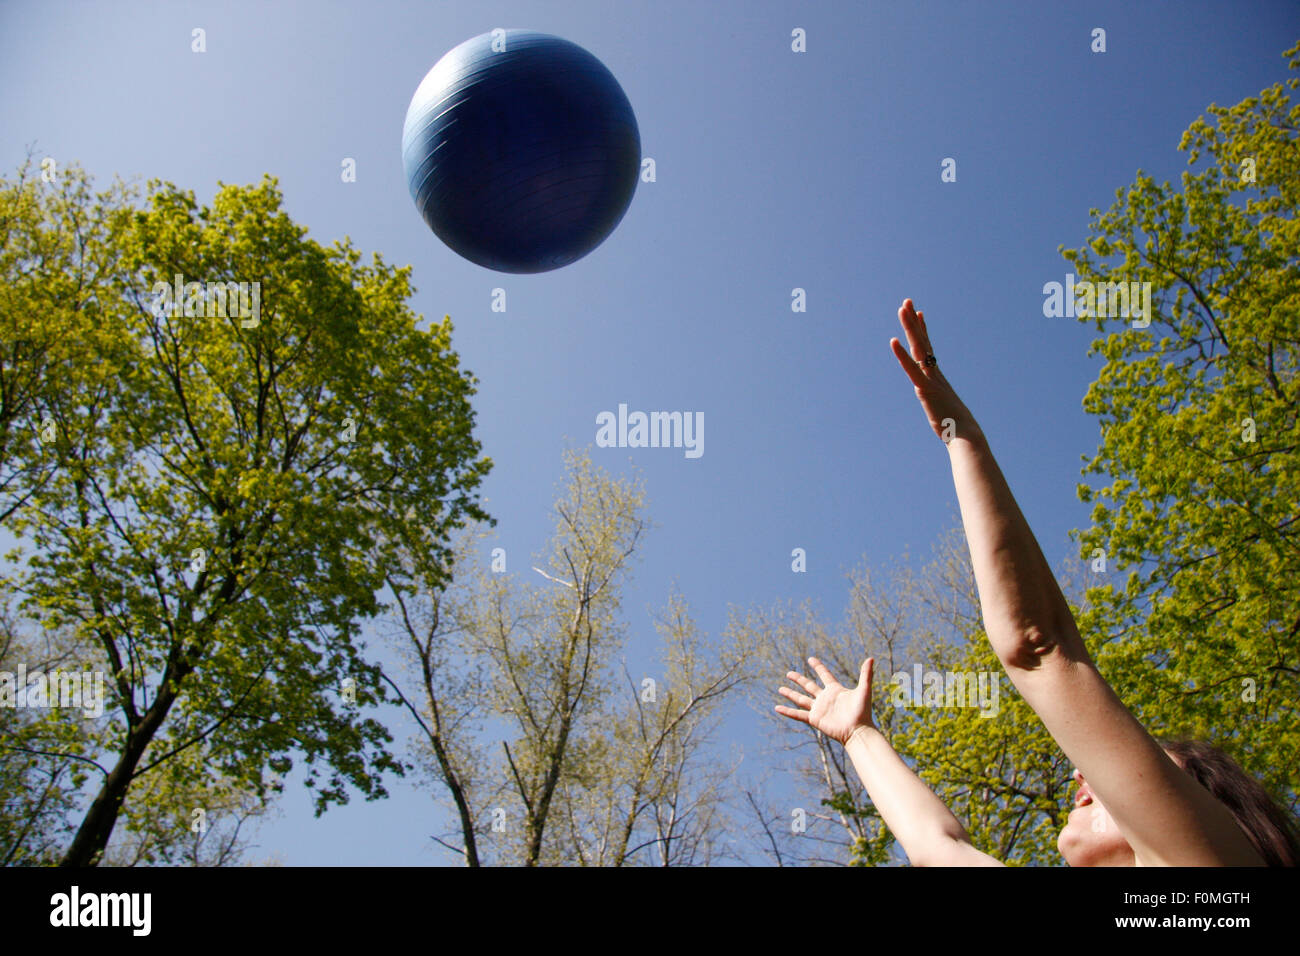 in Himmel geworfener Ball. - Stock Image